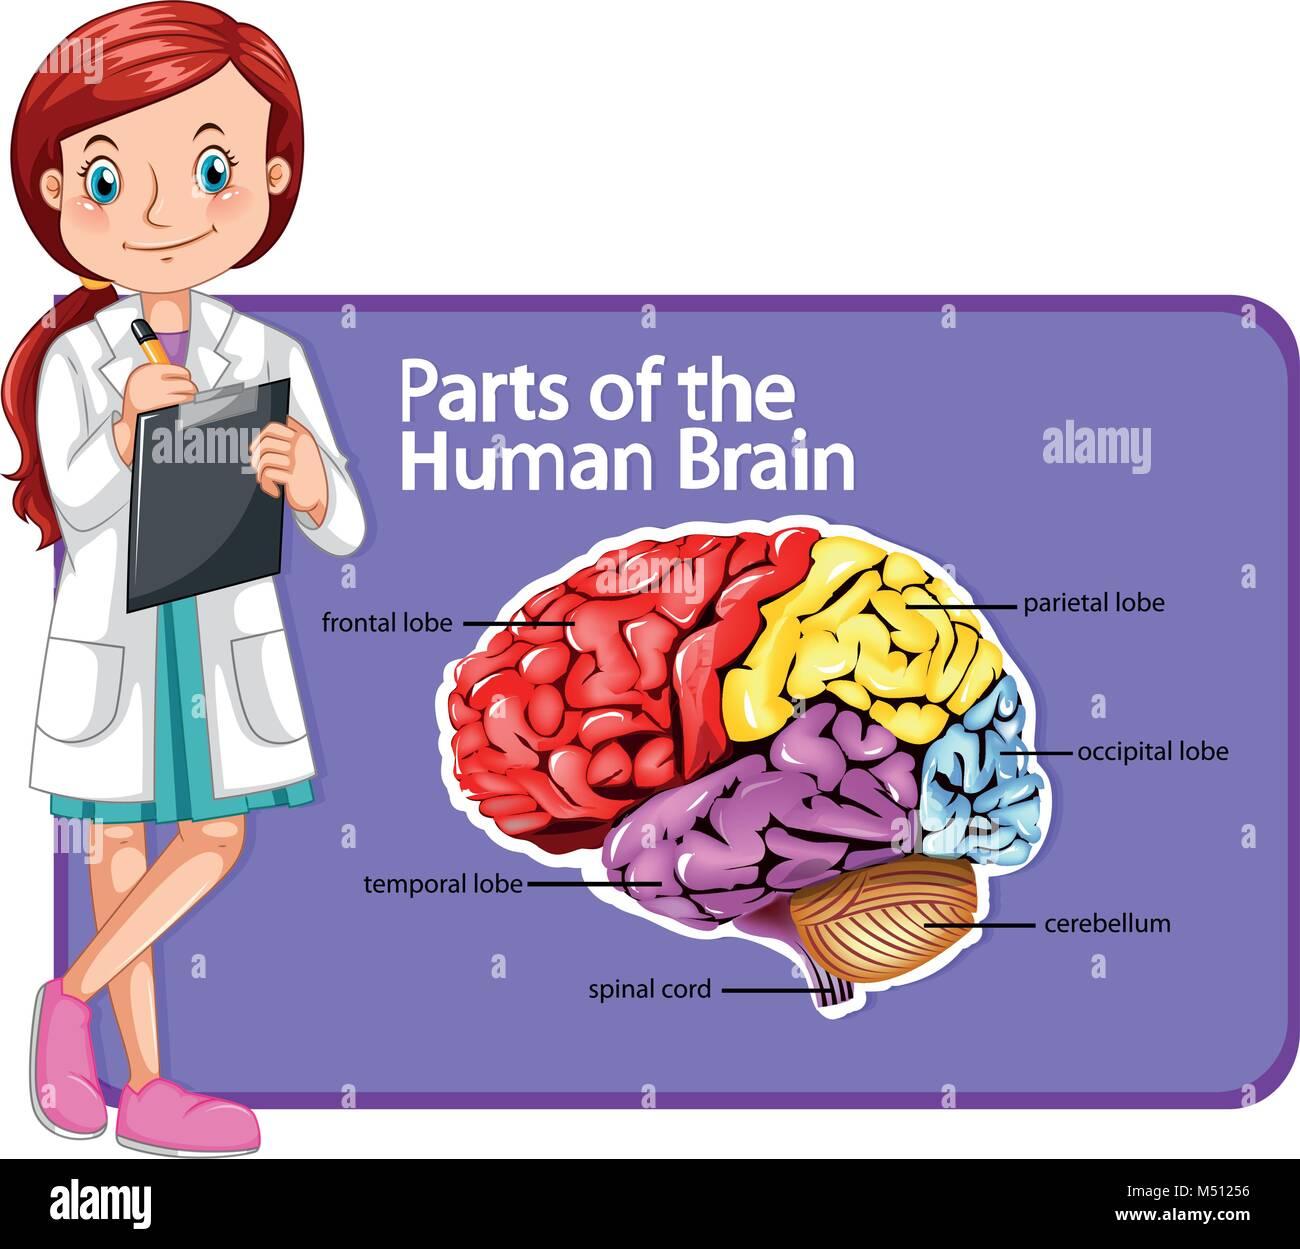 Image Human Brain Diagram Stock Photos Image Human Brain Diagram